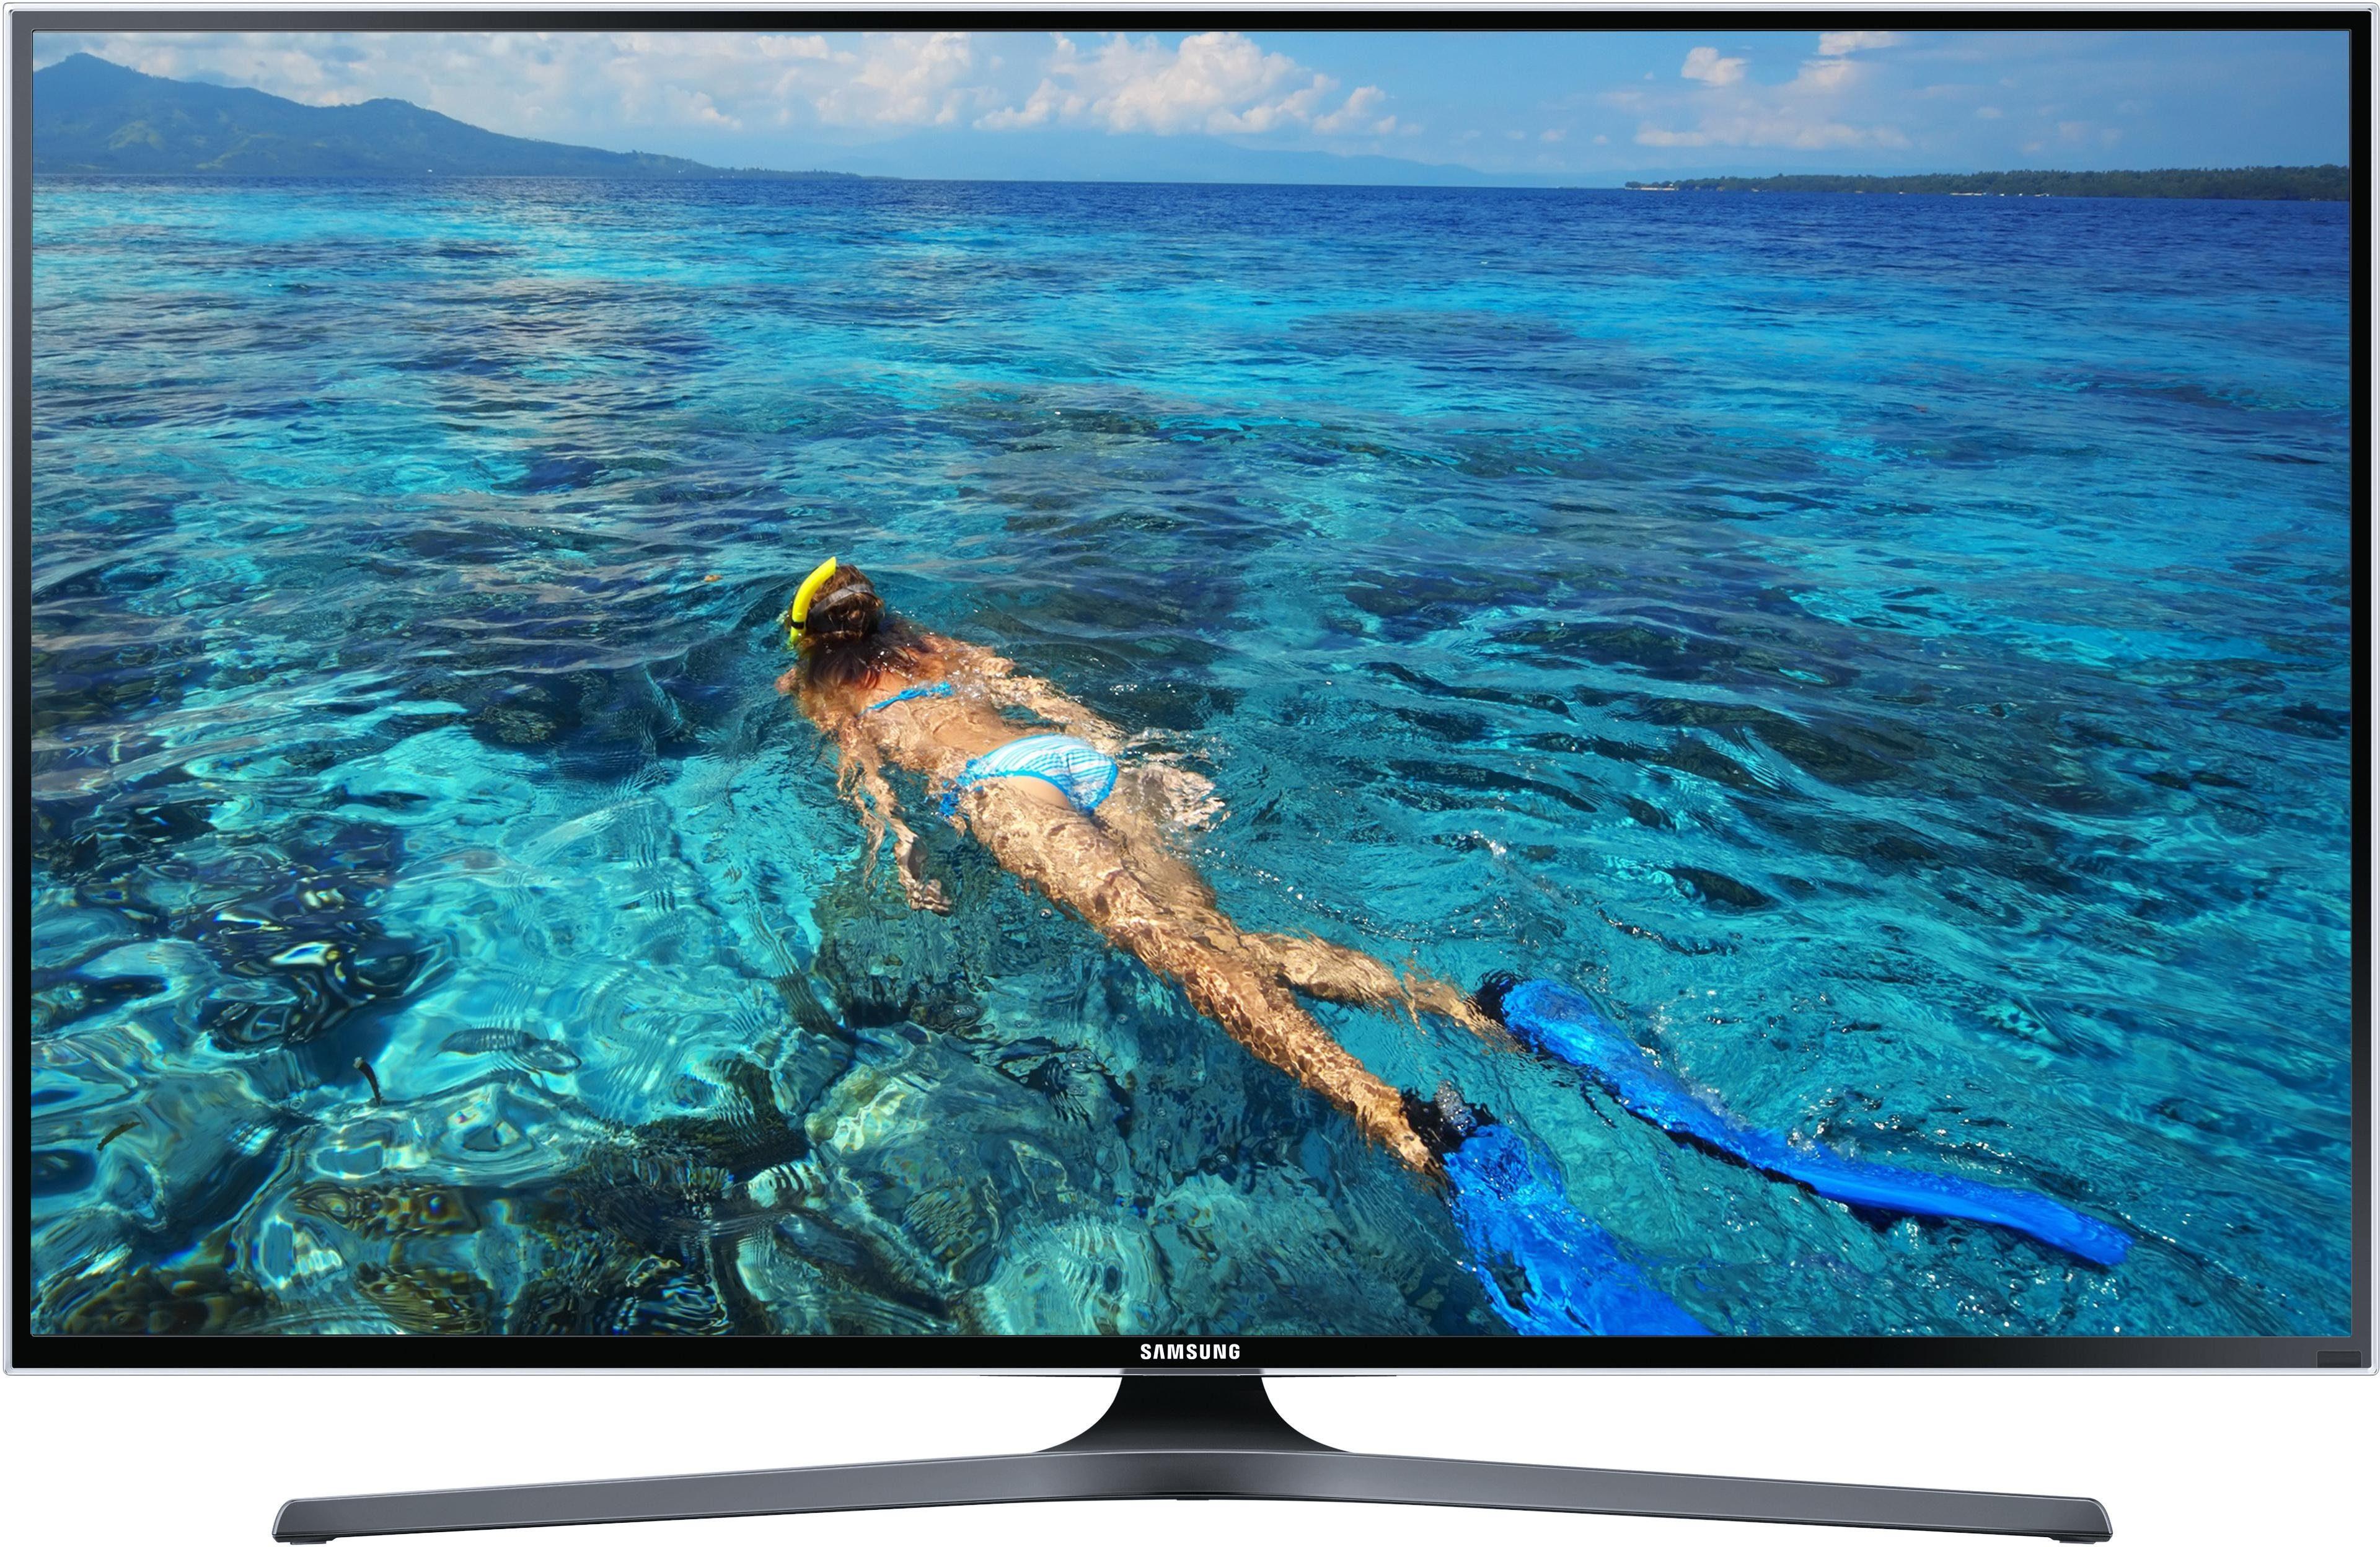 Samsung UE65J6299SUXZG, LED Fernseher, 163 cm (65 Zoll), 1080p (Full HD), Smart-TV